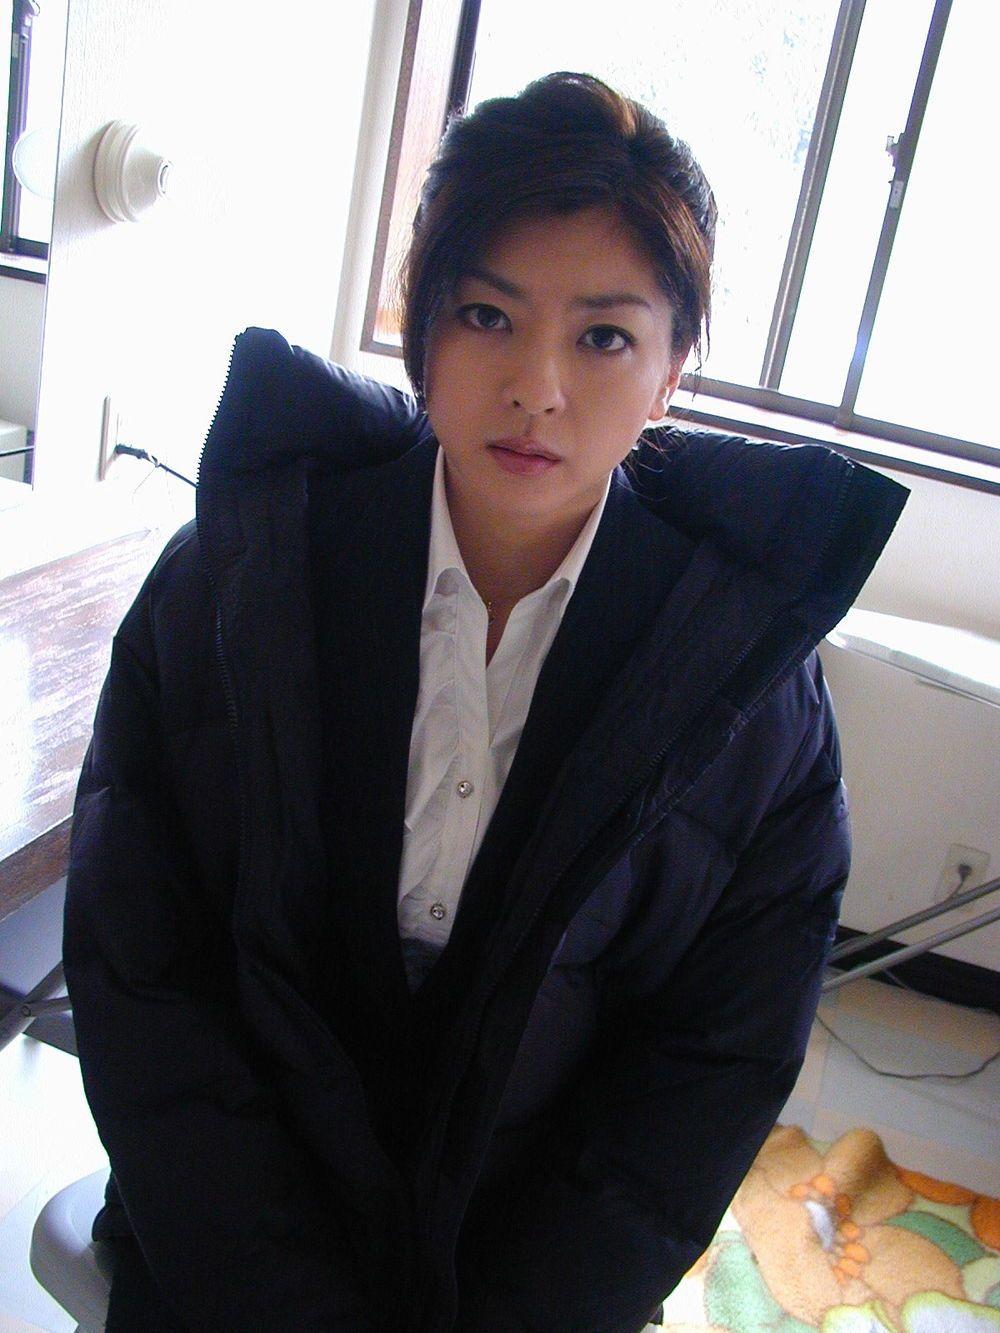 Watch Shinobu Nakayama video